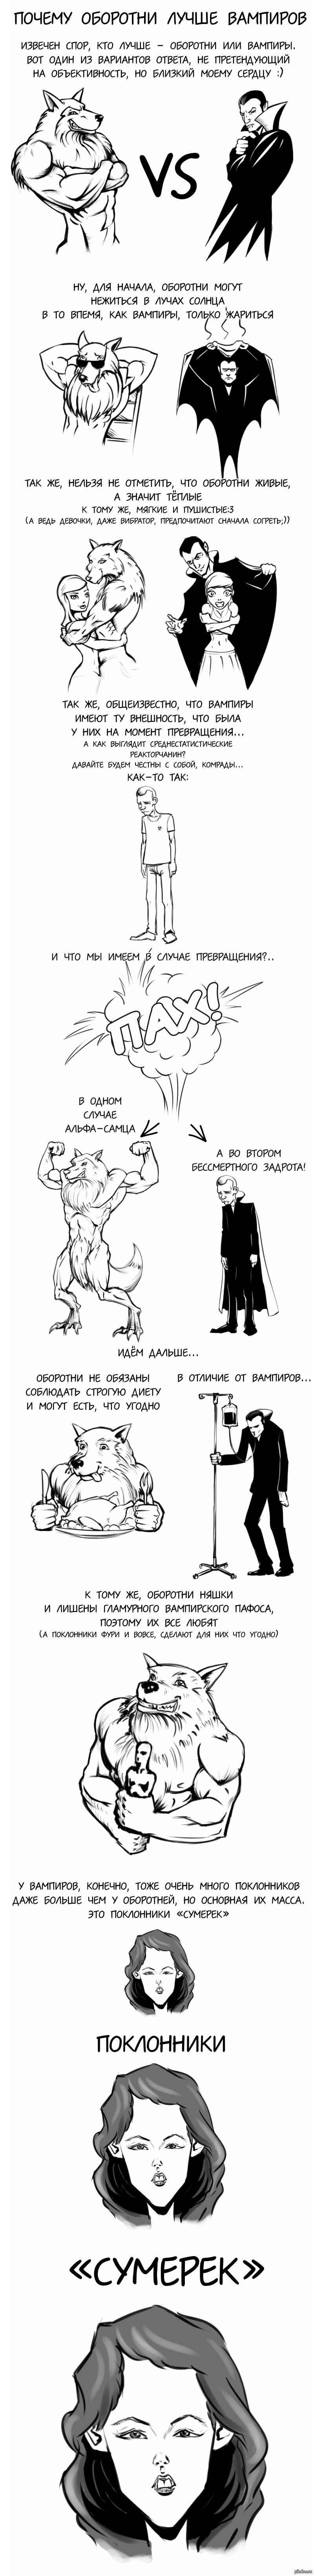 werewolf-vs-vampire